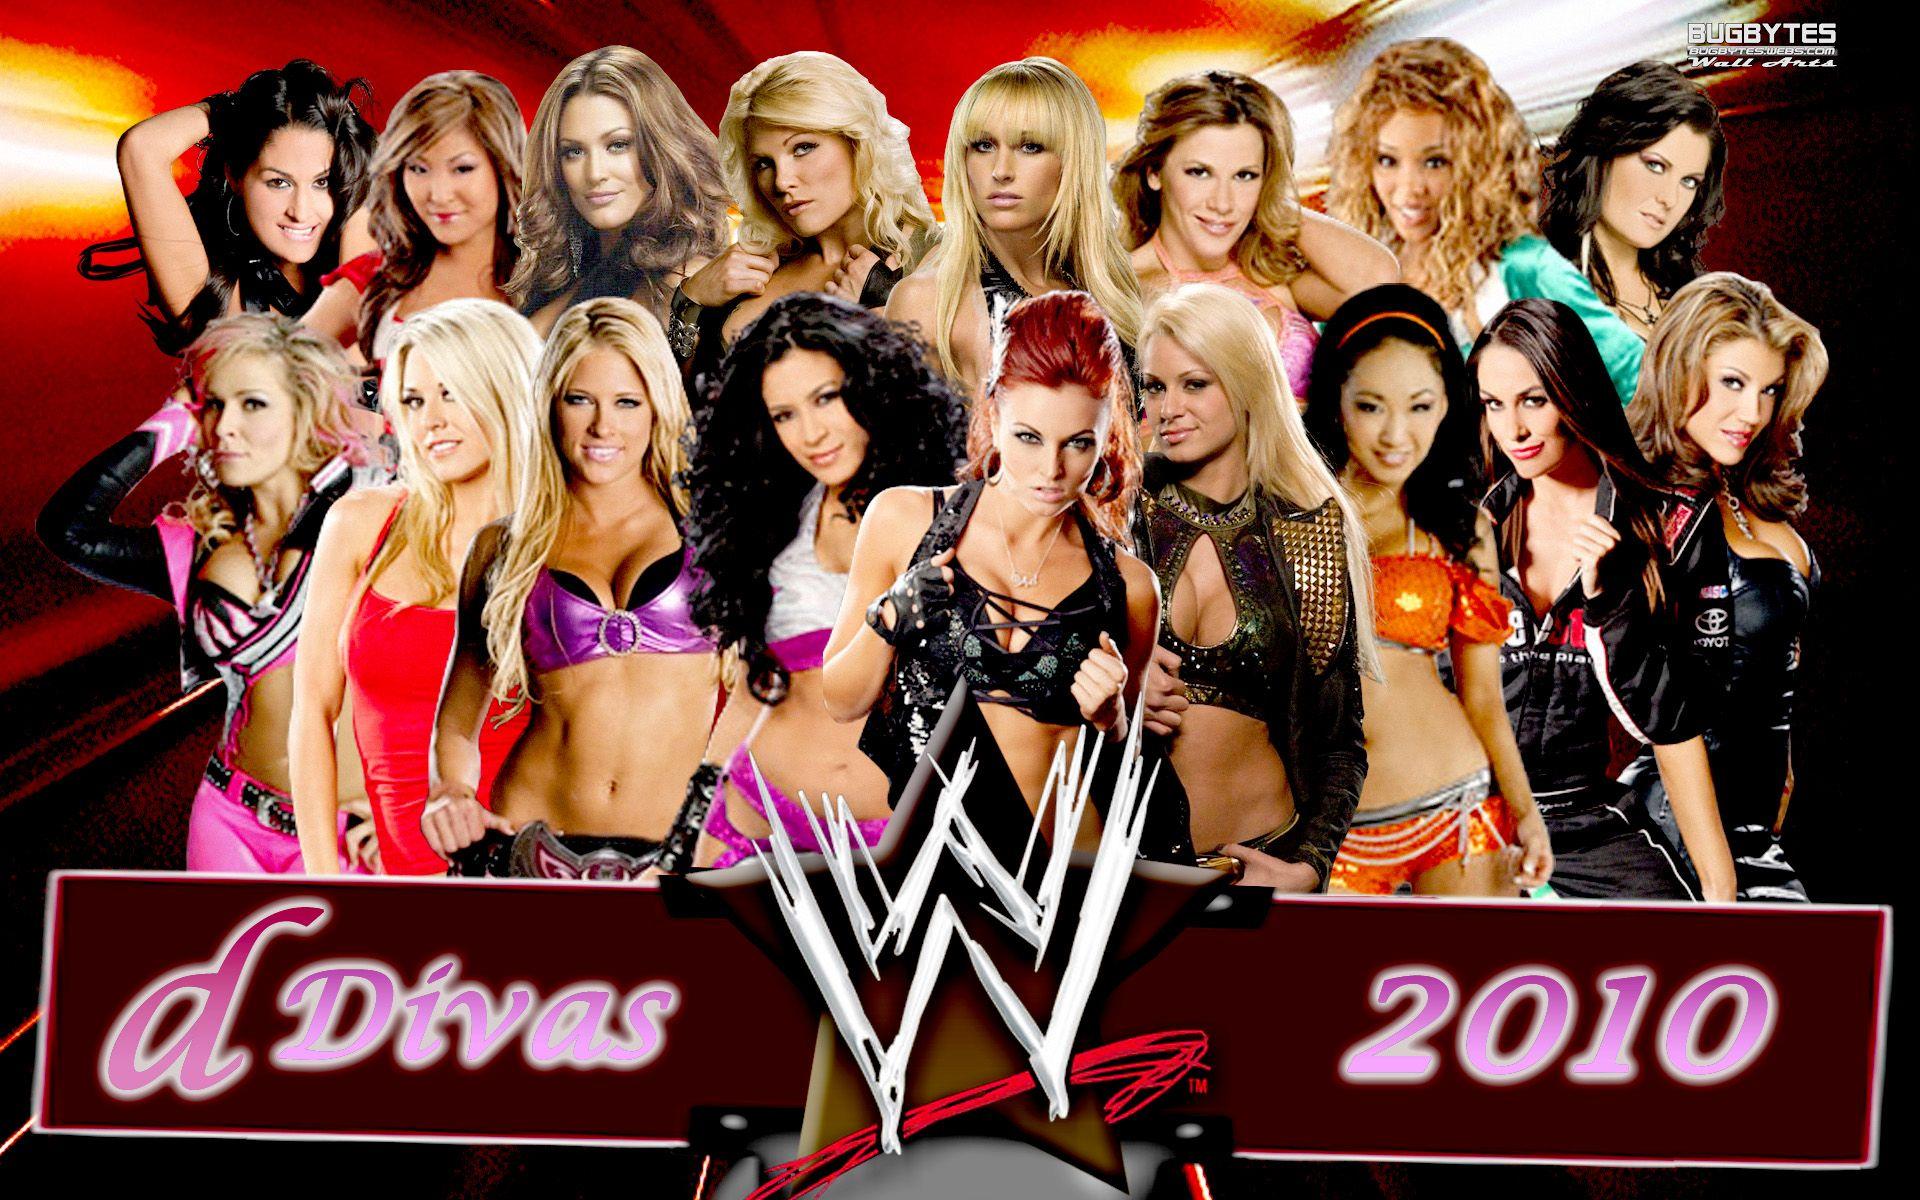 Wwe Divas Wallpaper Walls World Com Walls Wwe Divas Diva Wrestling Divas